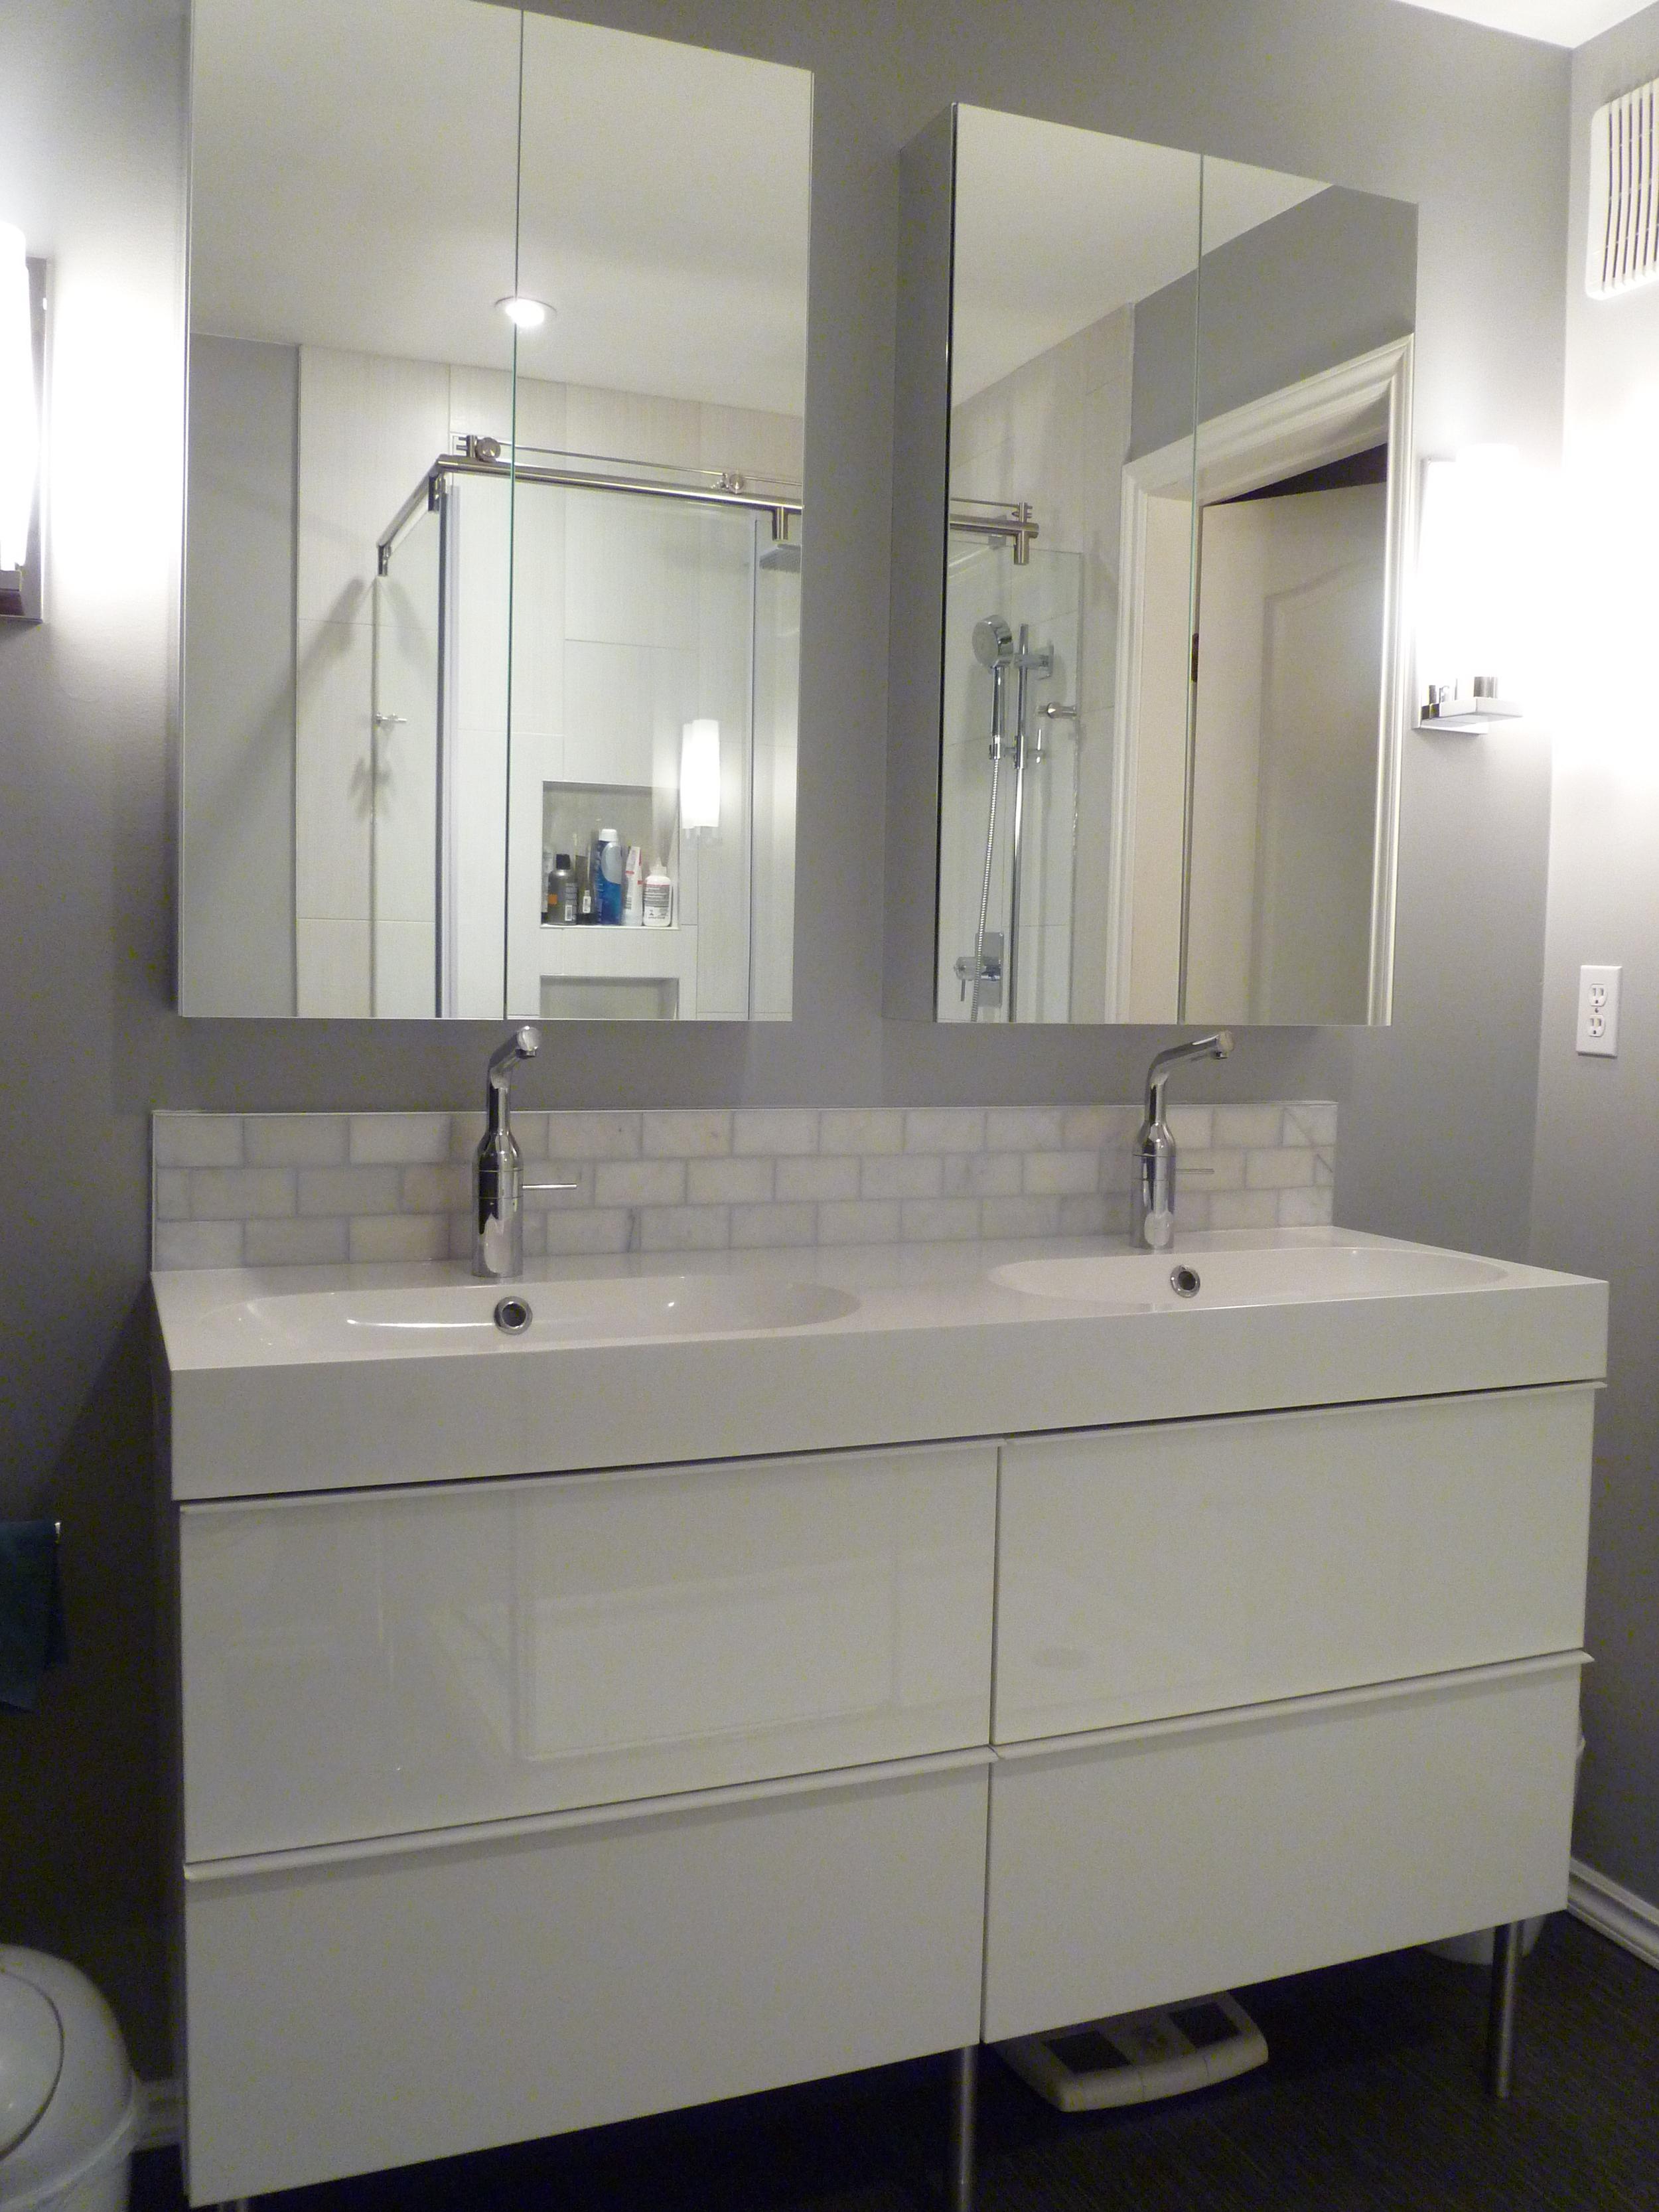 Ikea cabinet, marble backsplash, Godmorgon mirrored cabinets.